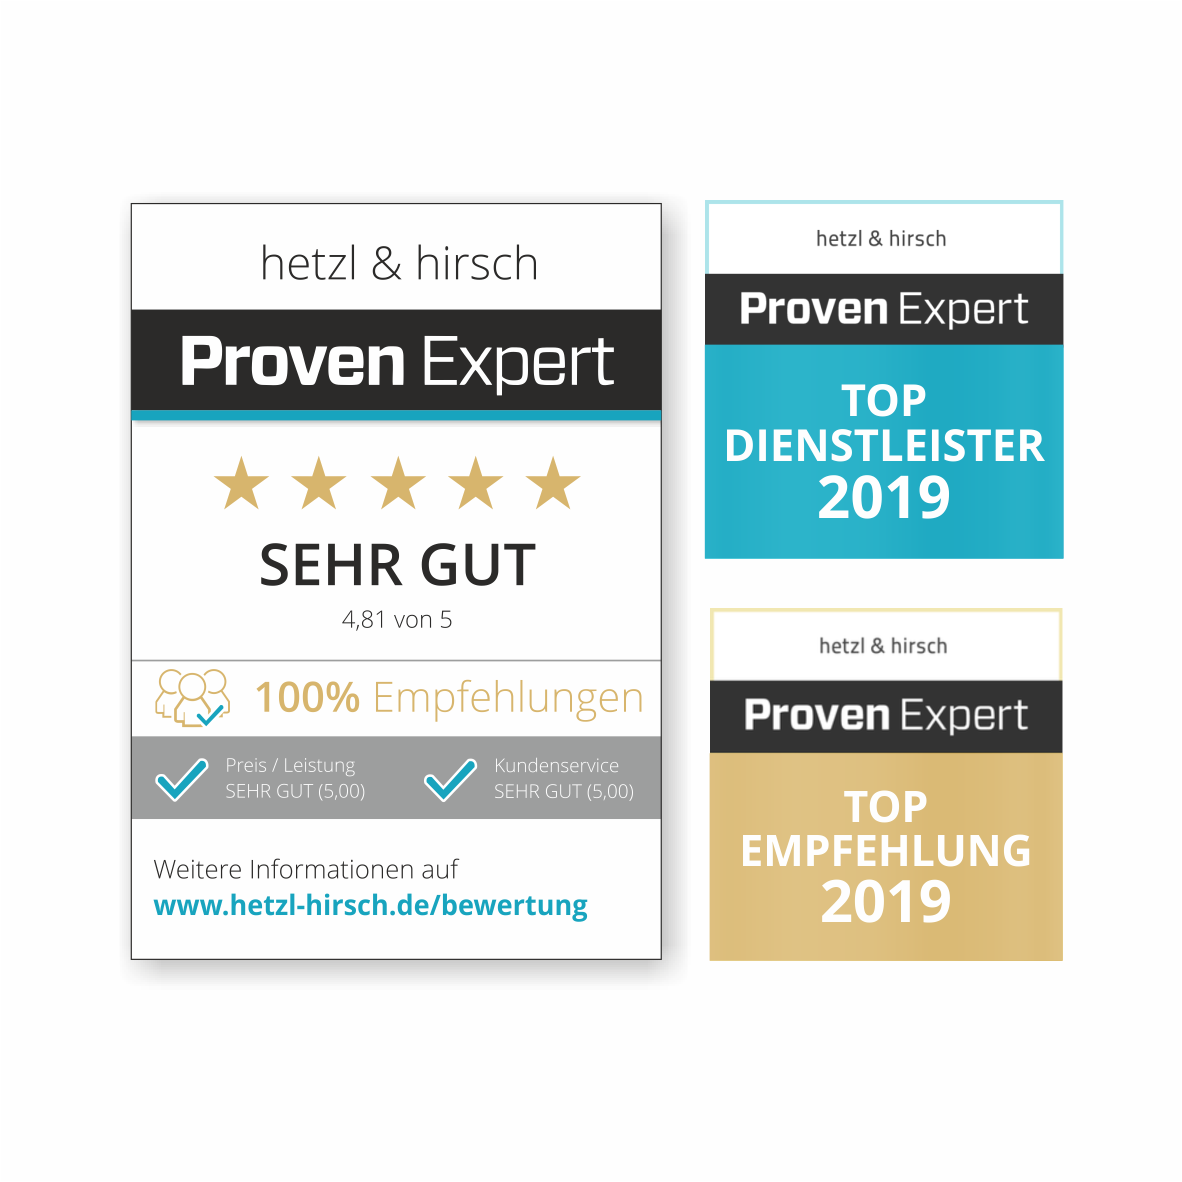 hetzl-hirsch_proven-expert